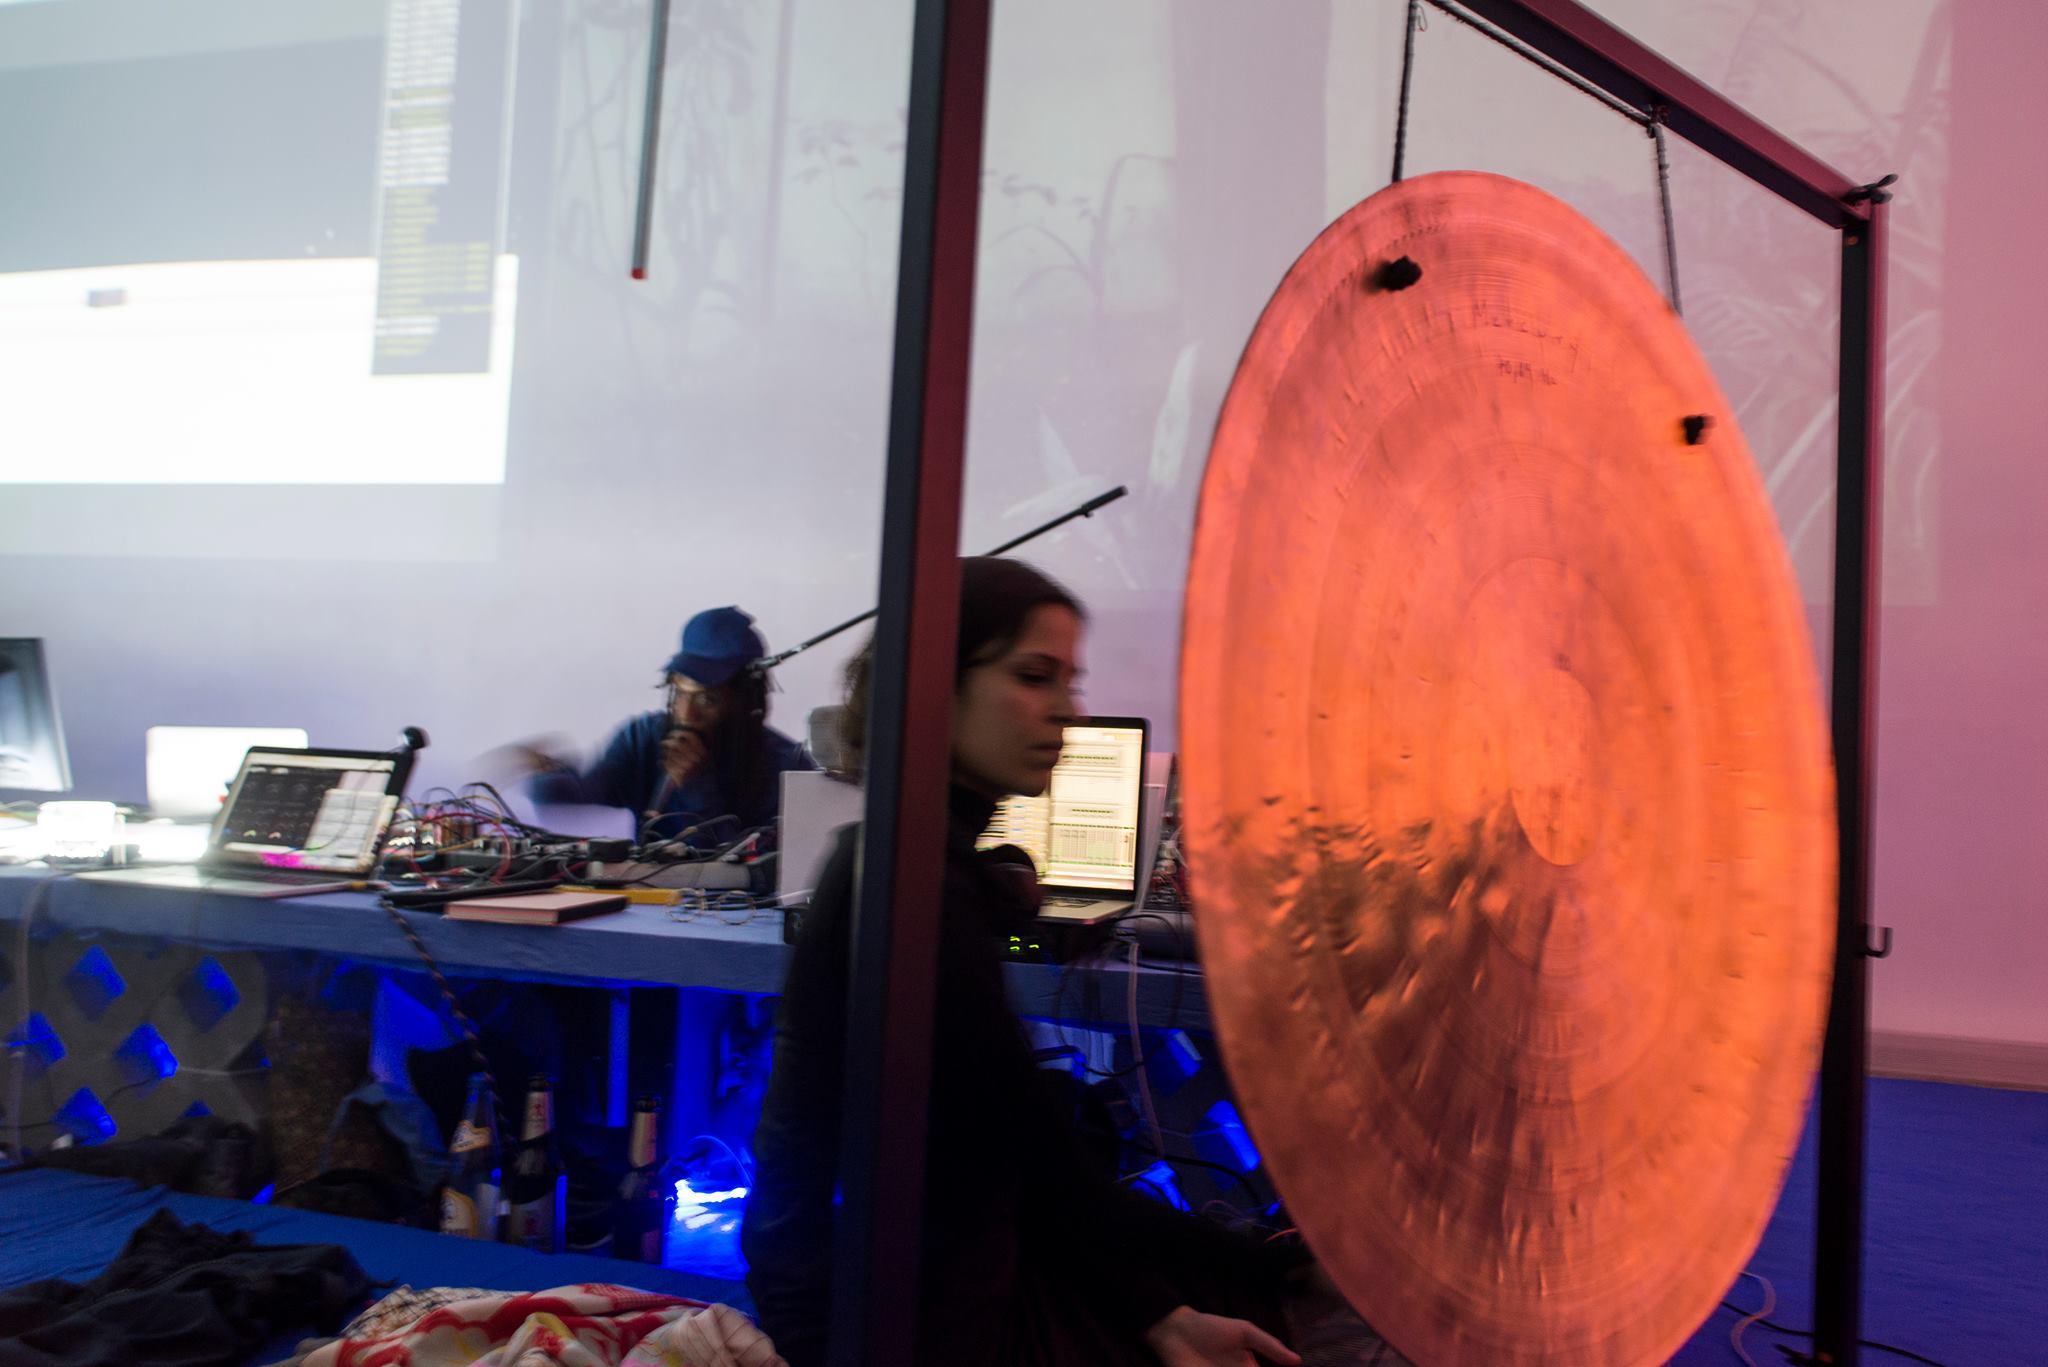 AMALGAMA Experience/ Transmediale Vorspiel. Sound & Video Immersion